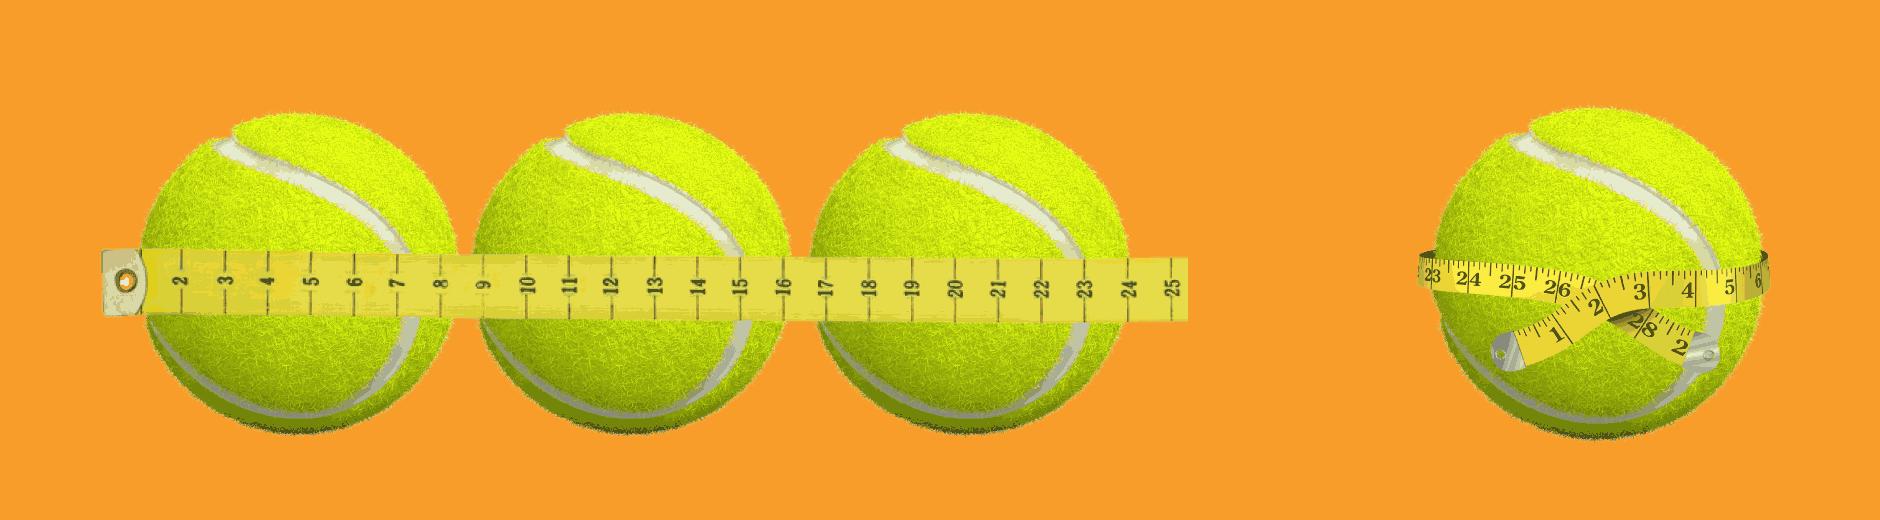 Resolve tennis balls